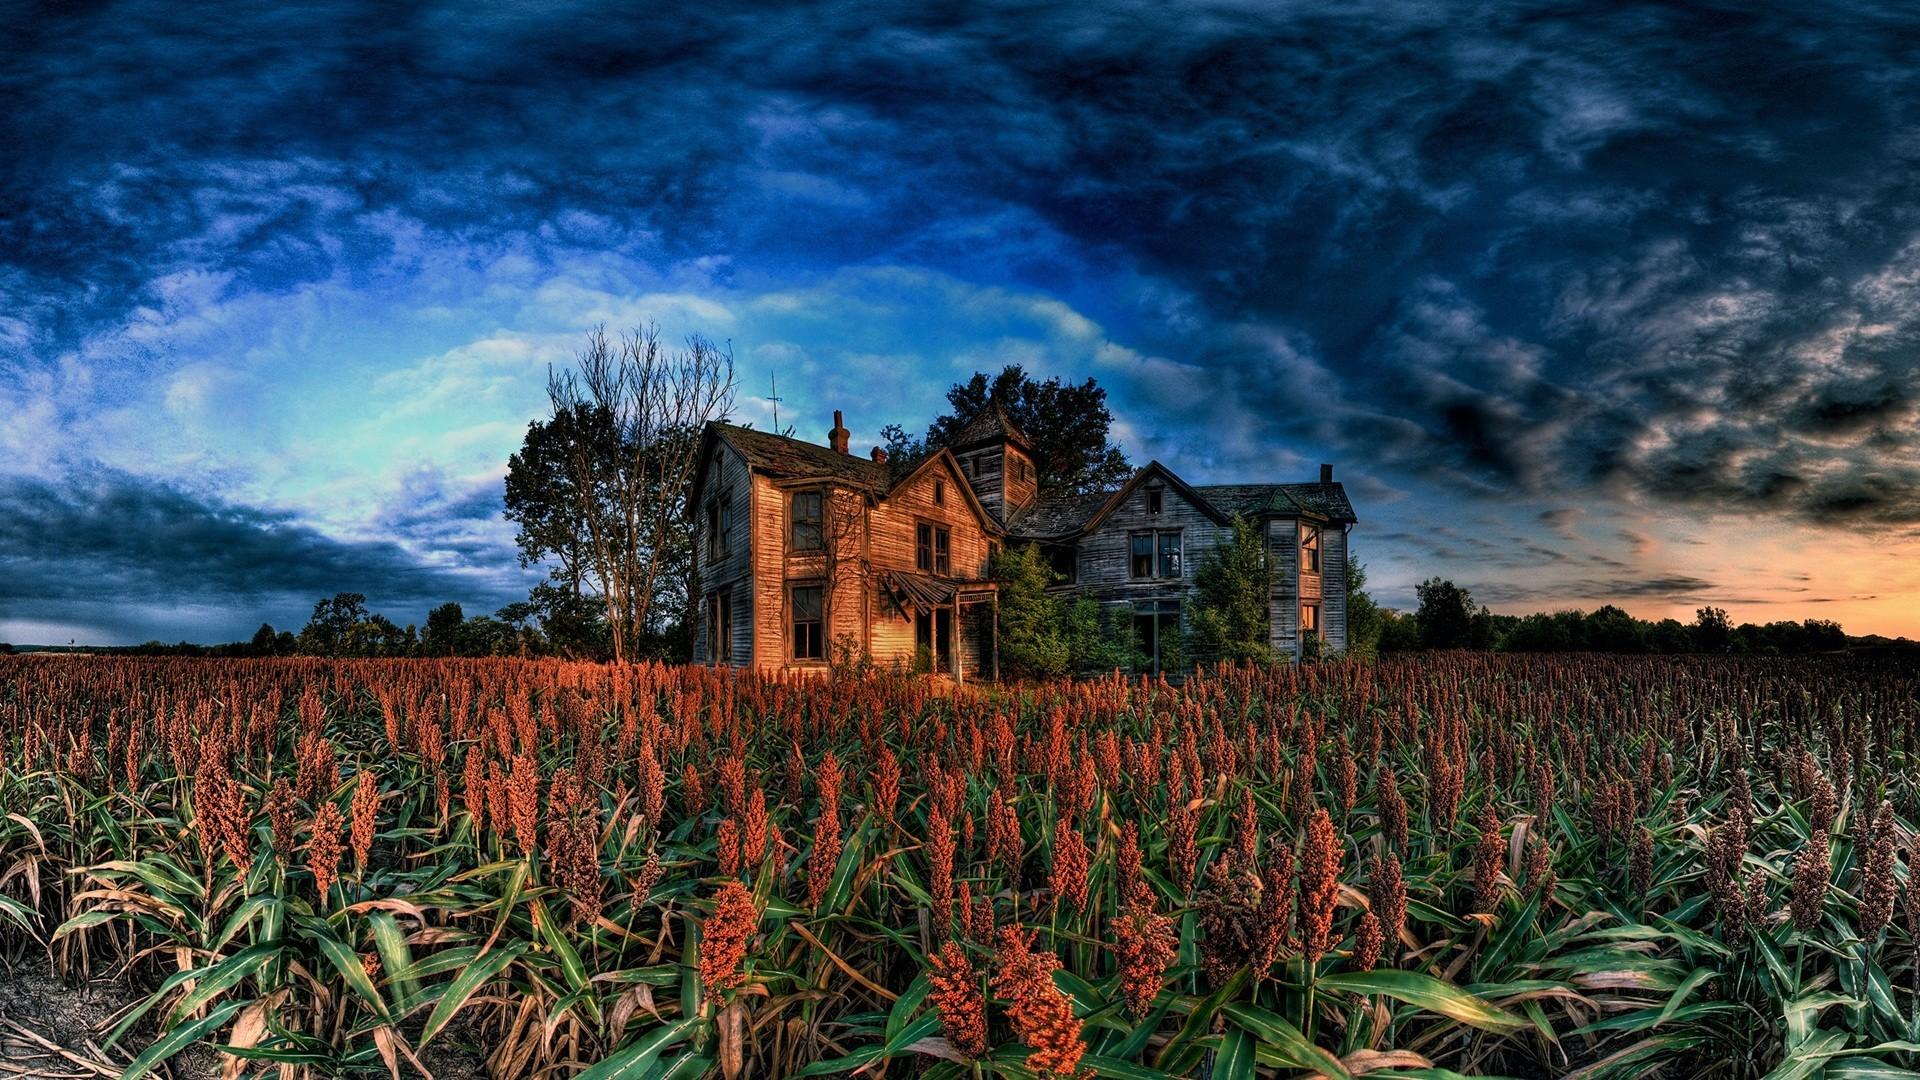 Res: 1920x1080, Green Farm House Wallpaper 1080p